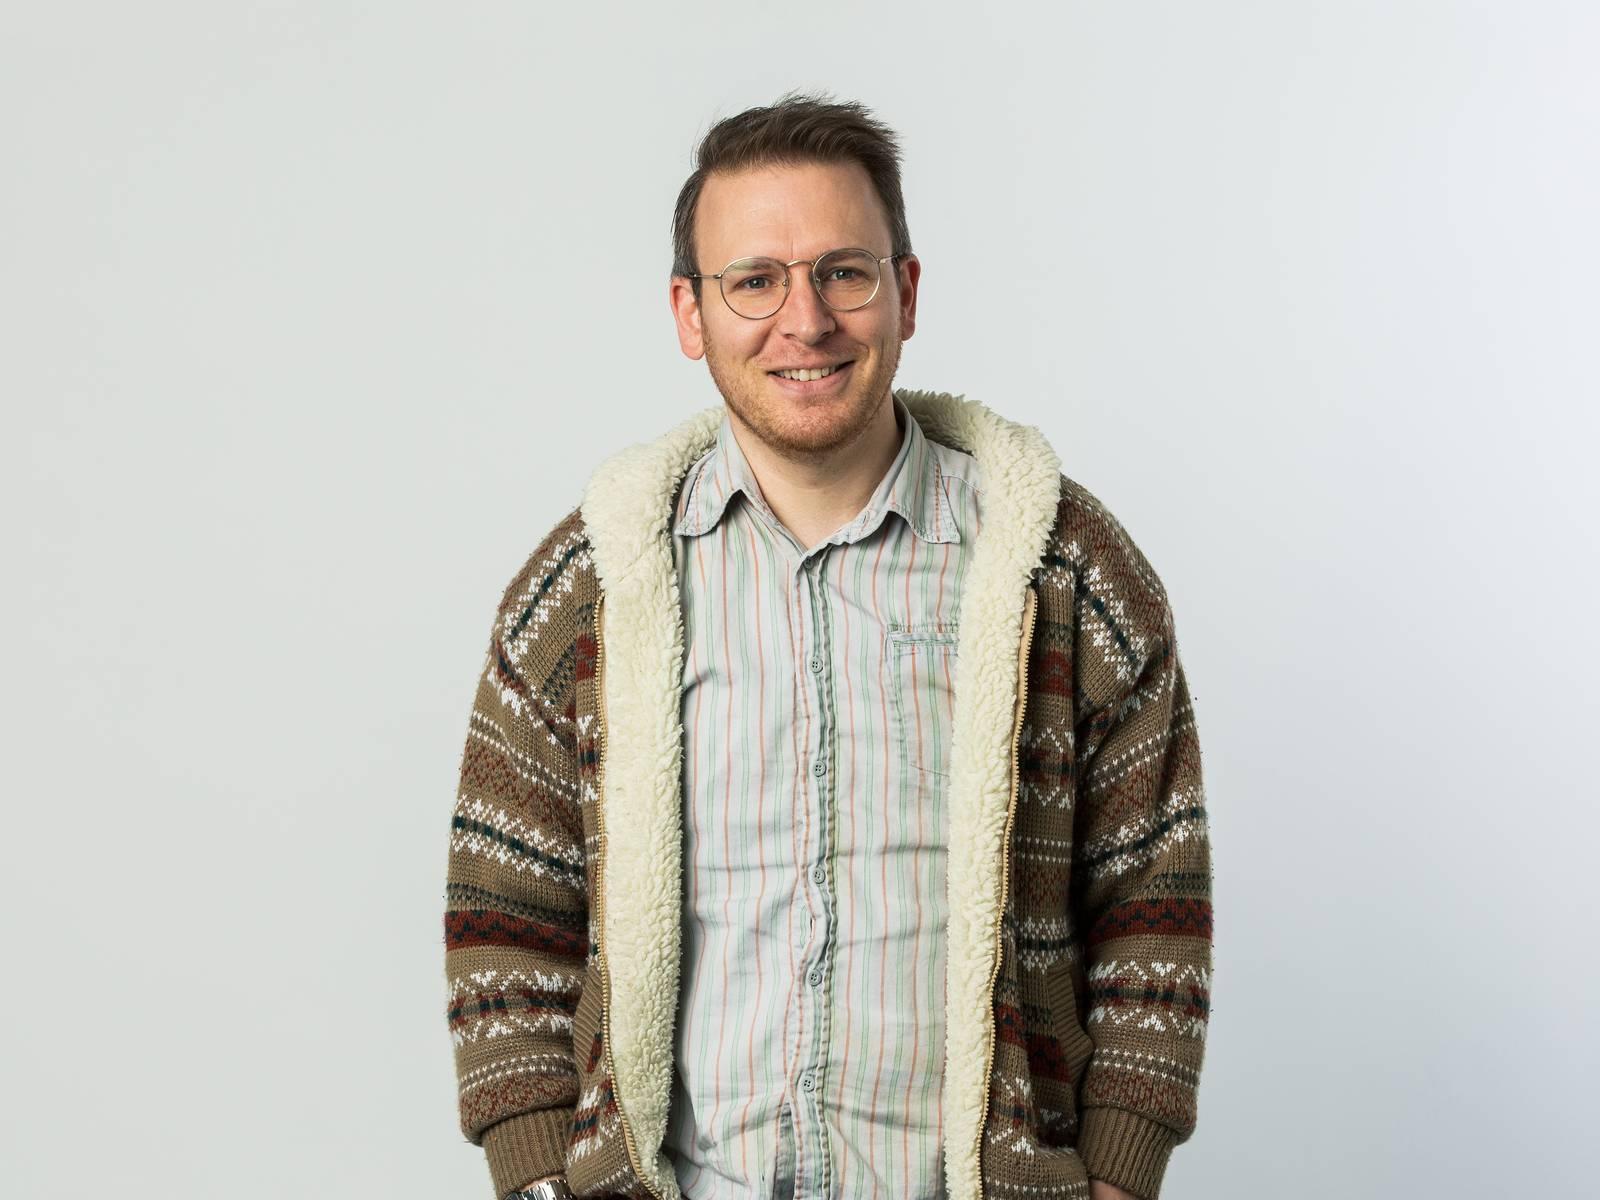 A profile image of